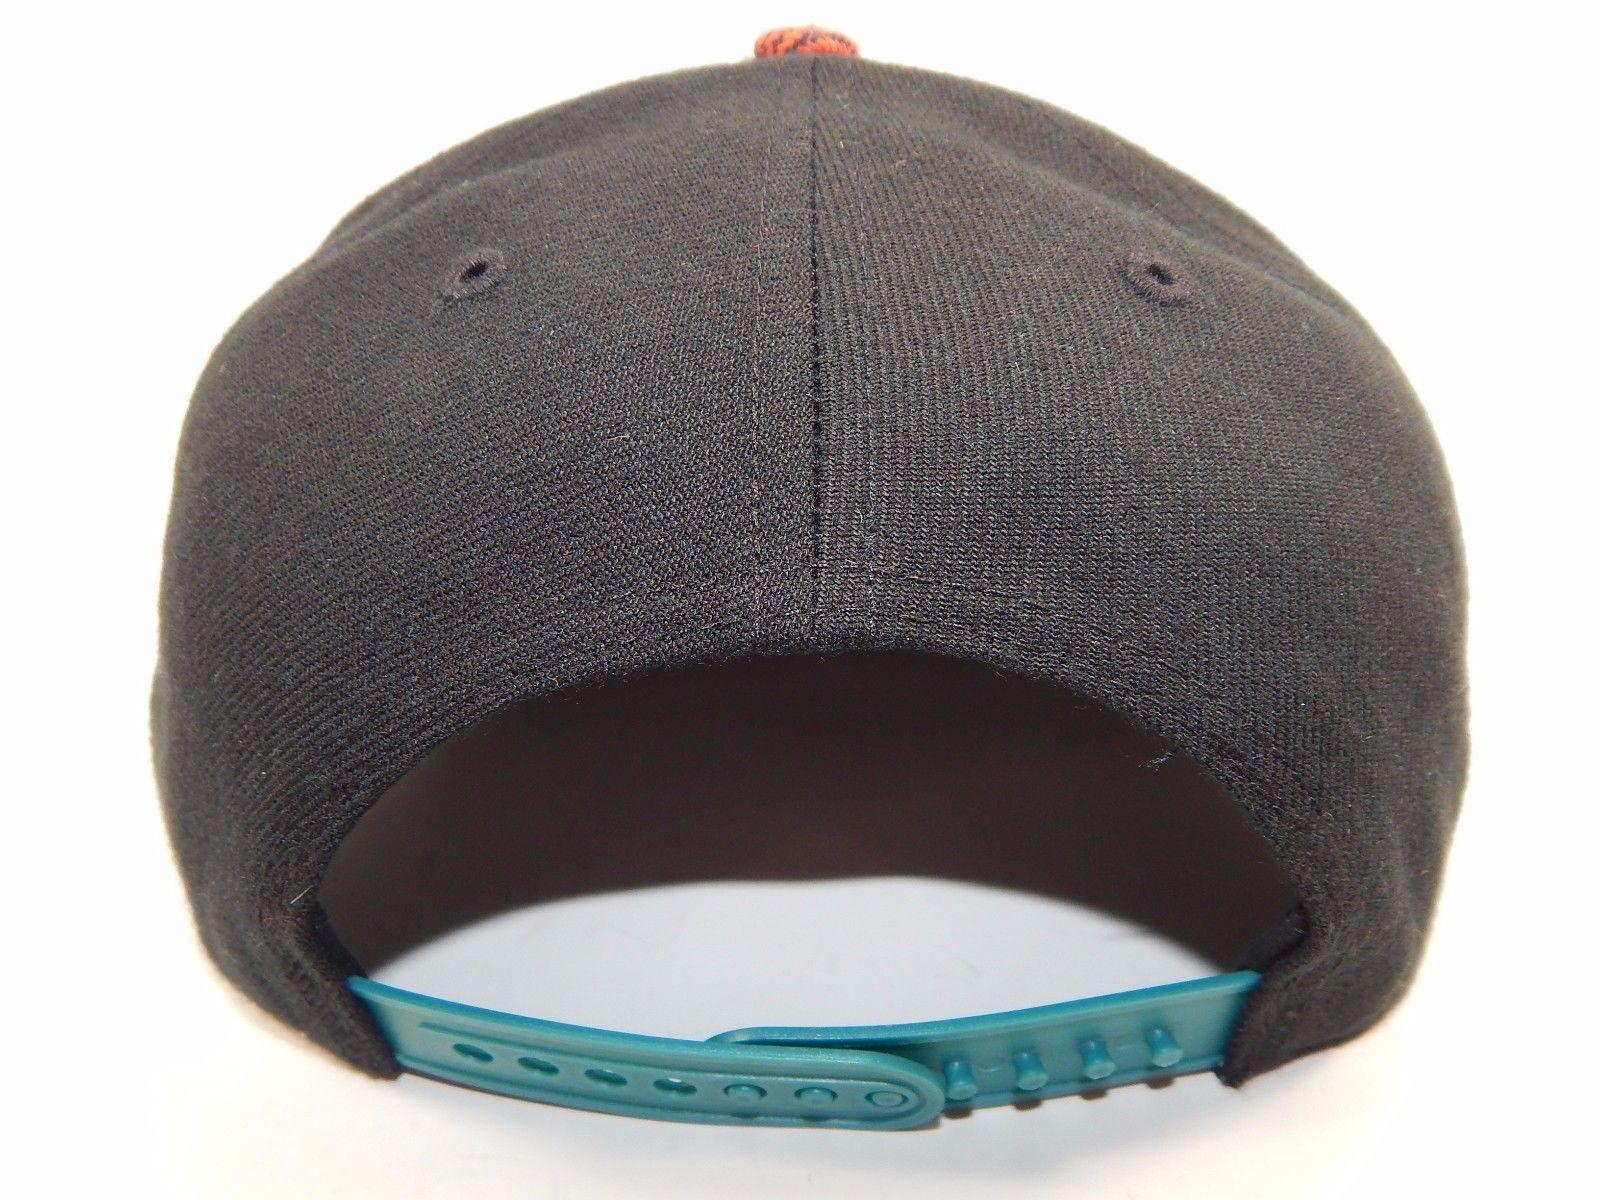 Chicago Bulls Windy City 47 Brand Official NBA Flannel Brim Snapback Cap Hat